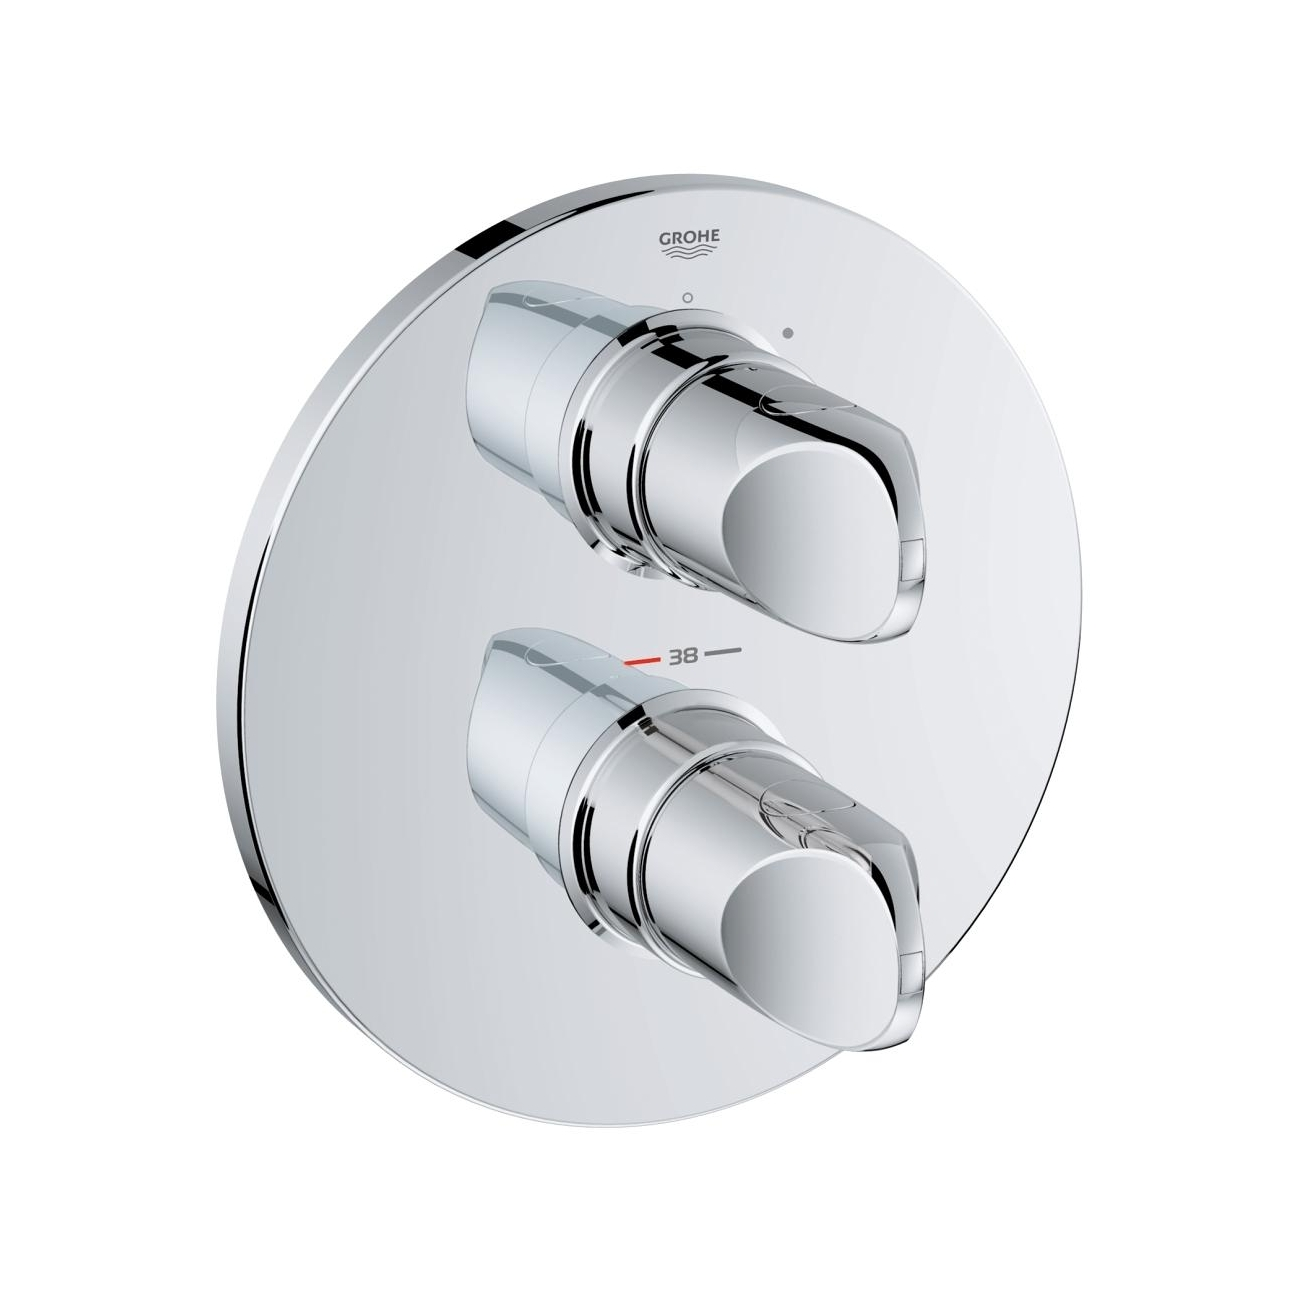 GROHE VERIS Thermostatic shower mixer - TattaHome